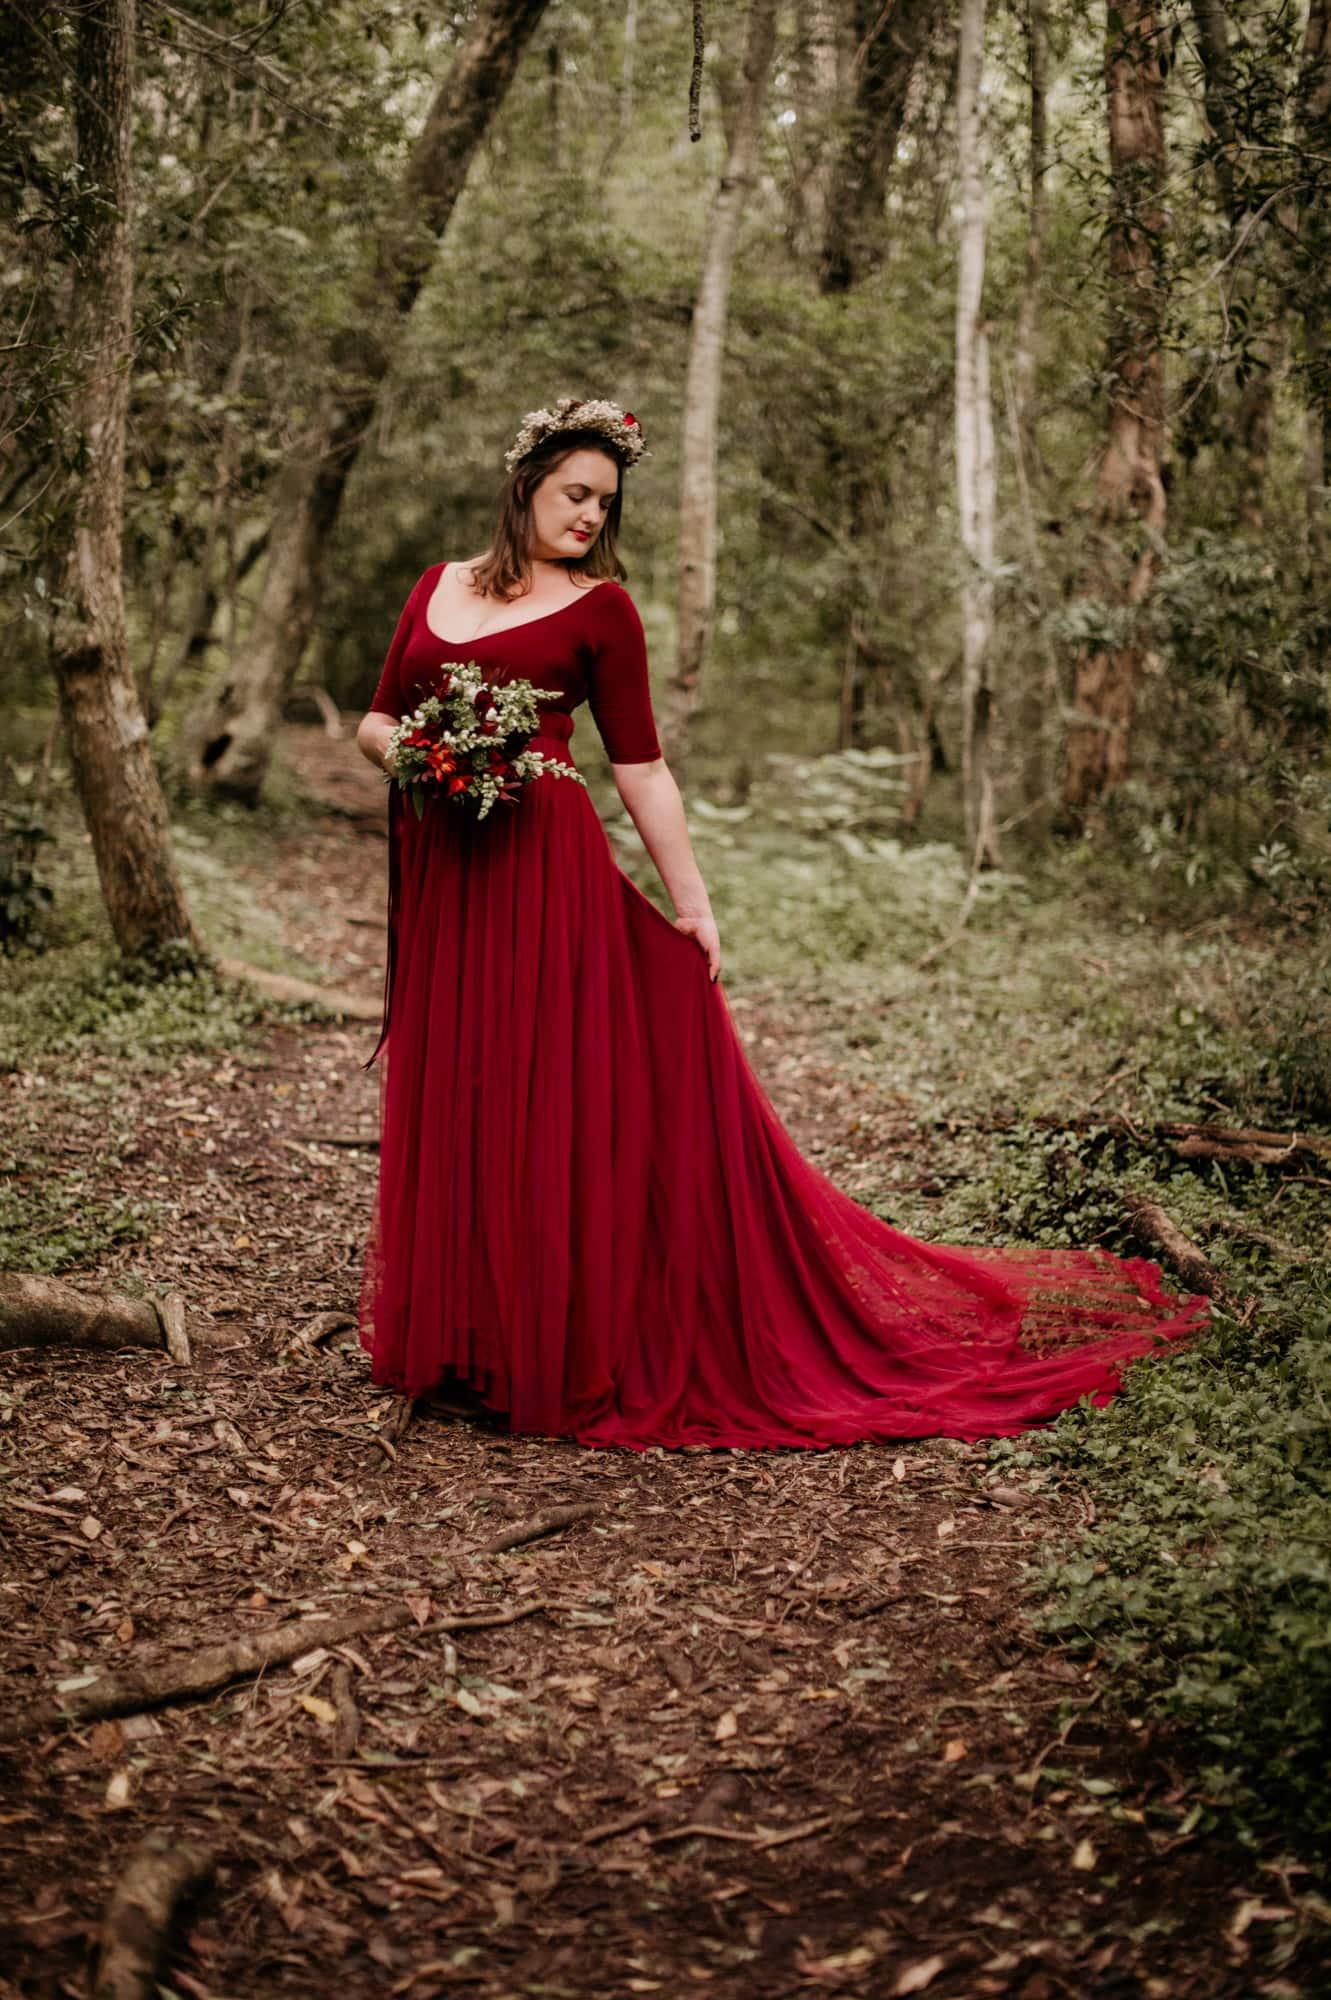 wesley-lanie-george-fernridge-engagement-June-Richards-Photography-Destination-Weddings-Elopements-Garden-Route-32